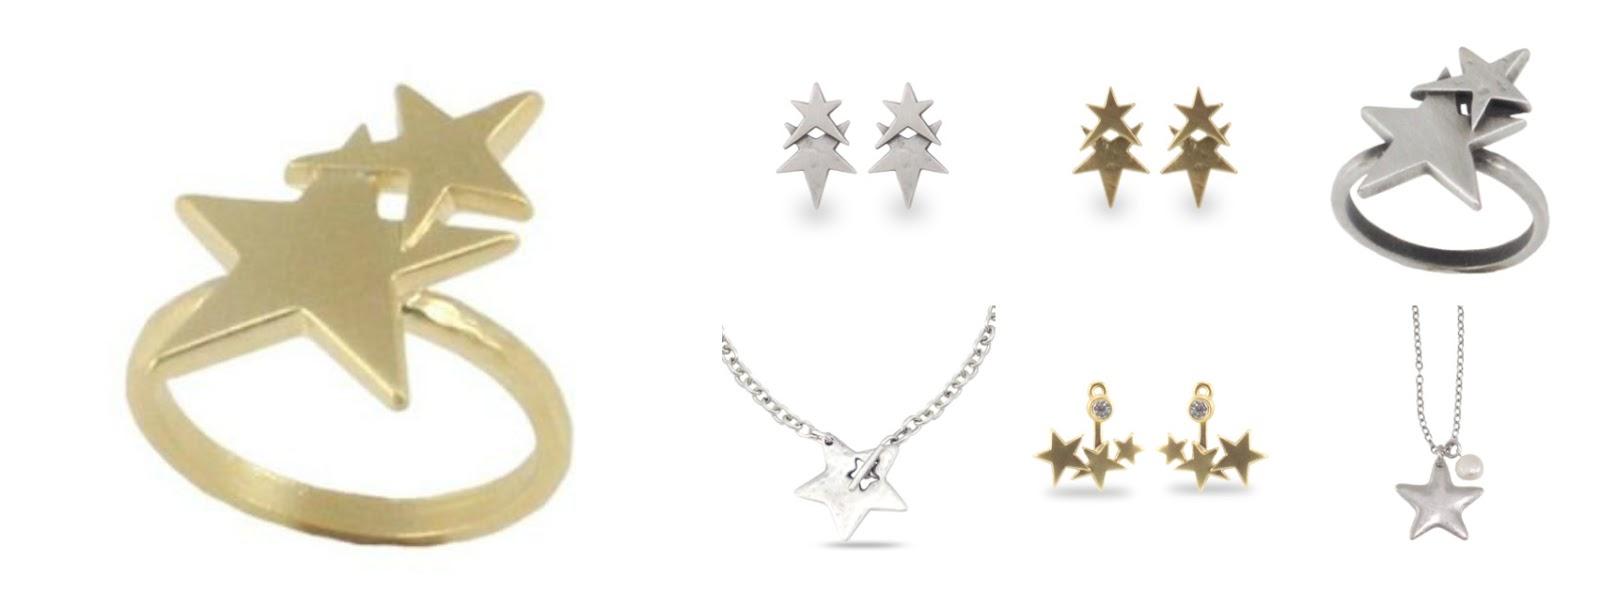 Danon star jewellery from LizzyO https://www.whatlizzyloves.com/shop/